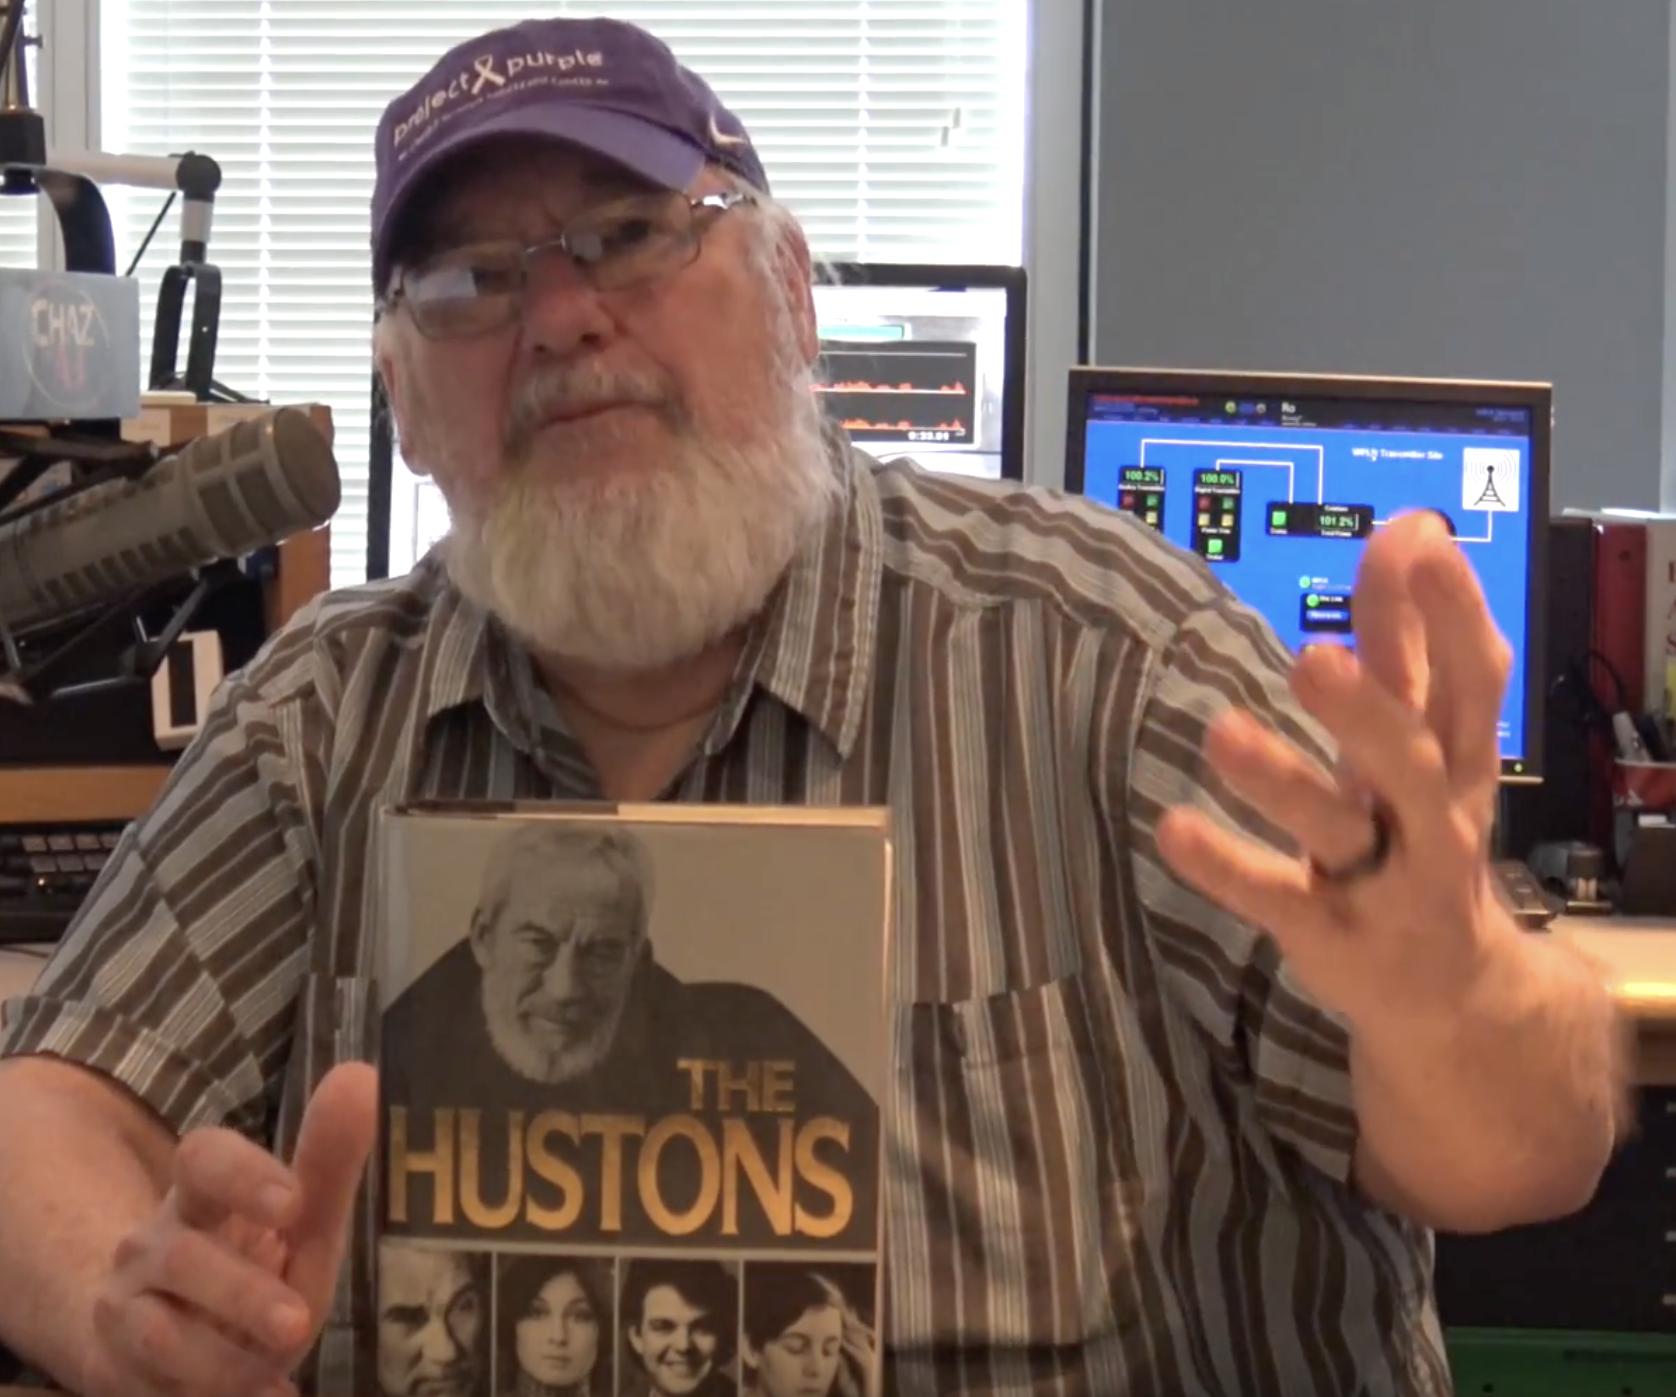 Wiggy's Books: The Hustons